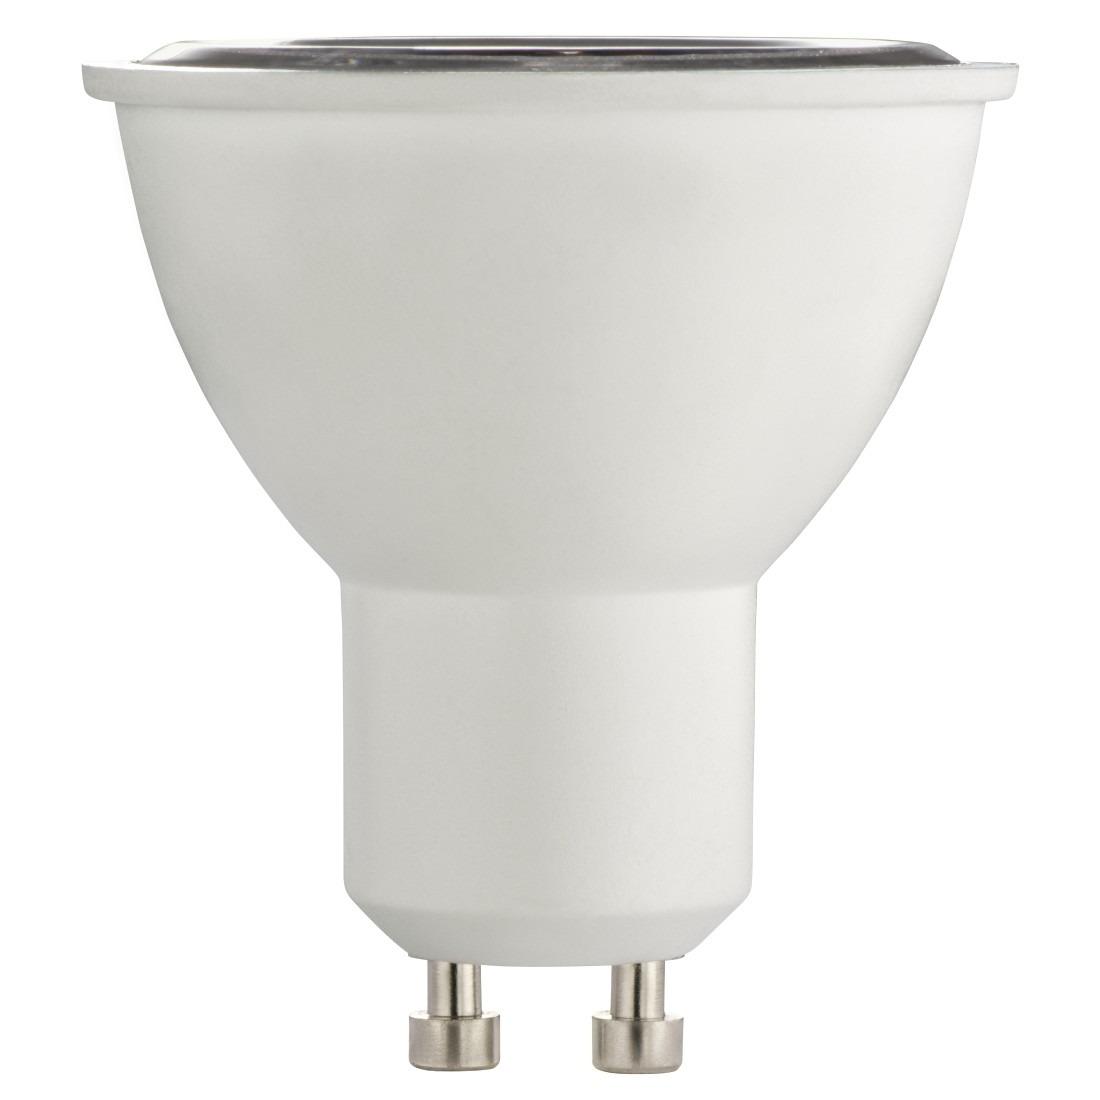 Korting Xavax Led lamp, GU10, 385lm vervangt 55W, reflectorlamp PAR16 RA90